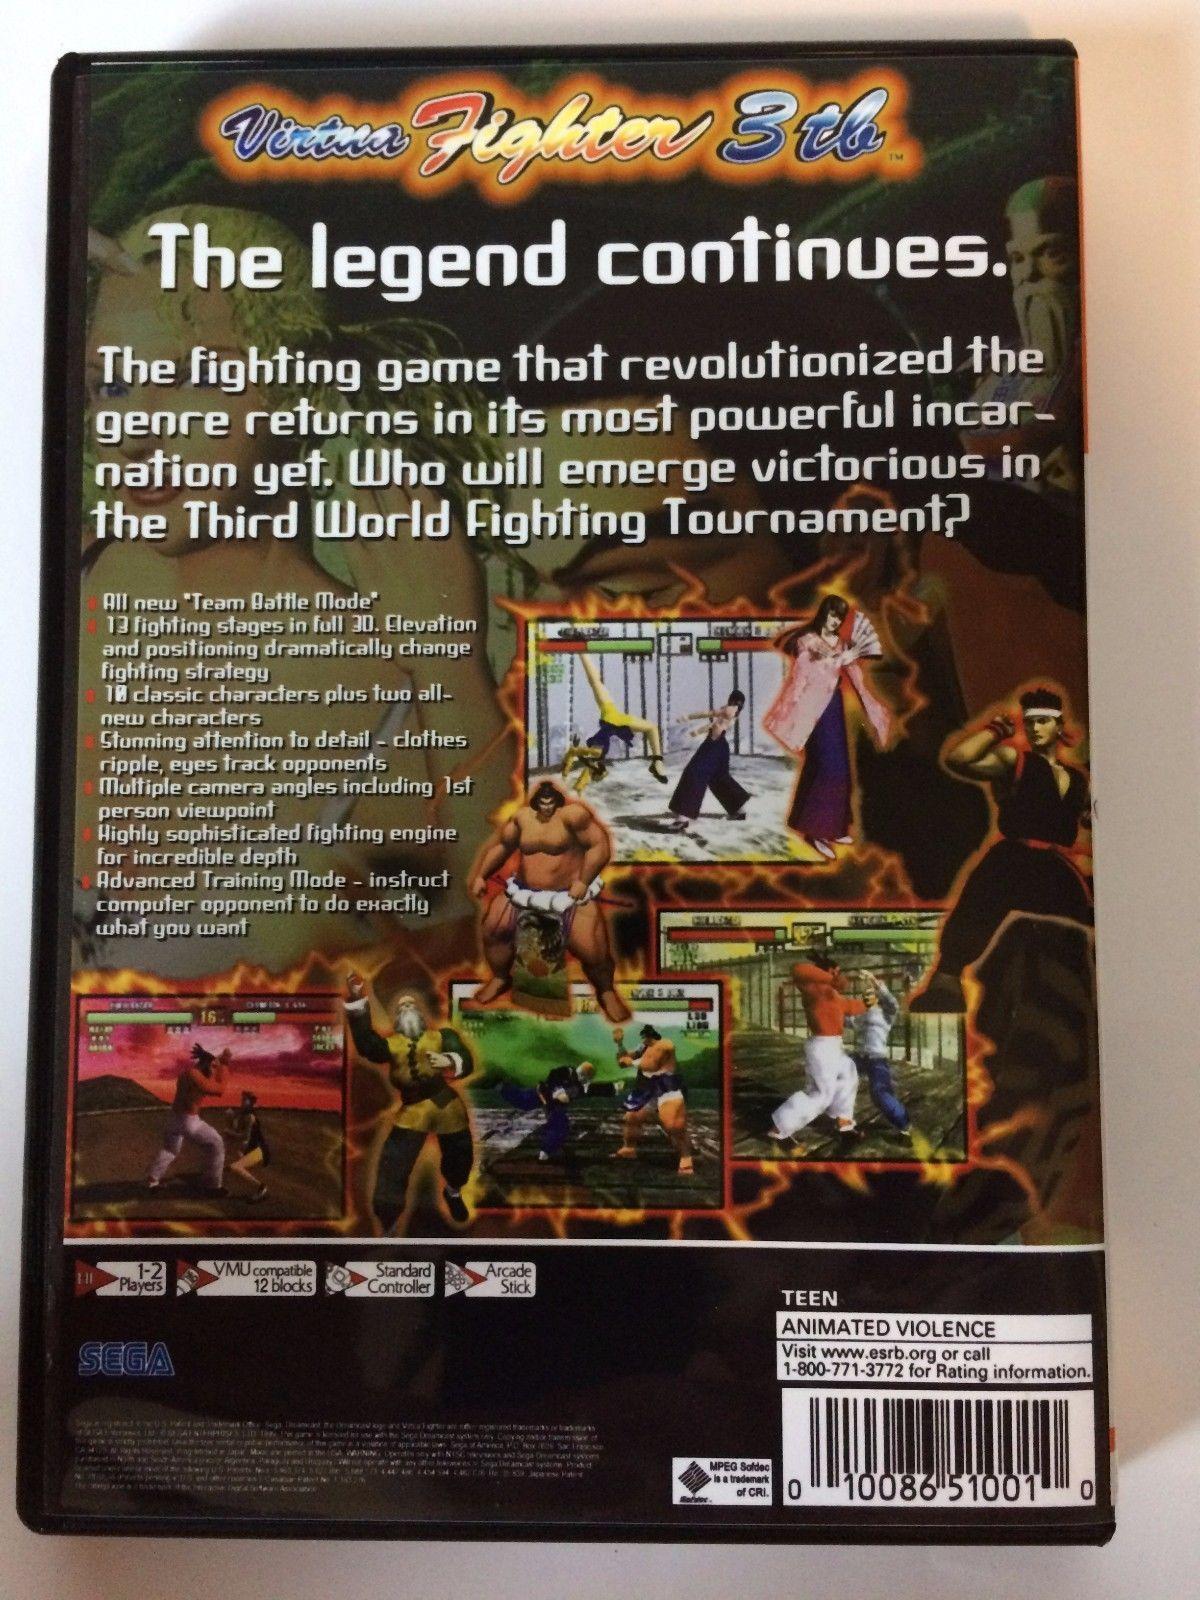 Virtua Fighter 3tb - Sega Dreamcast - Replacement Case - No Game